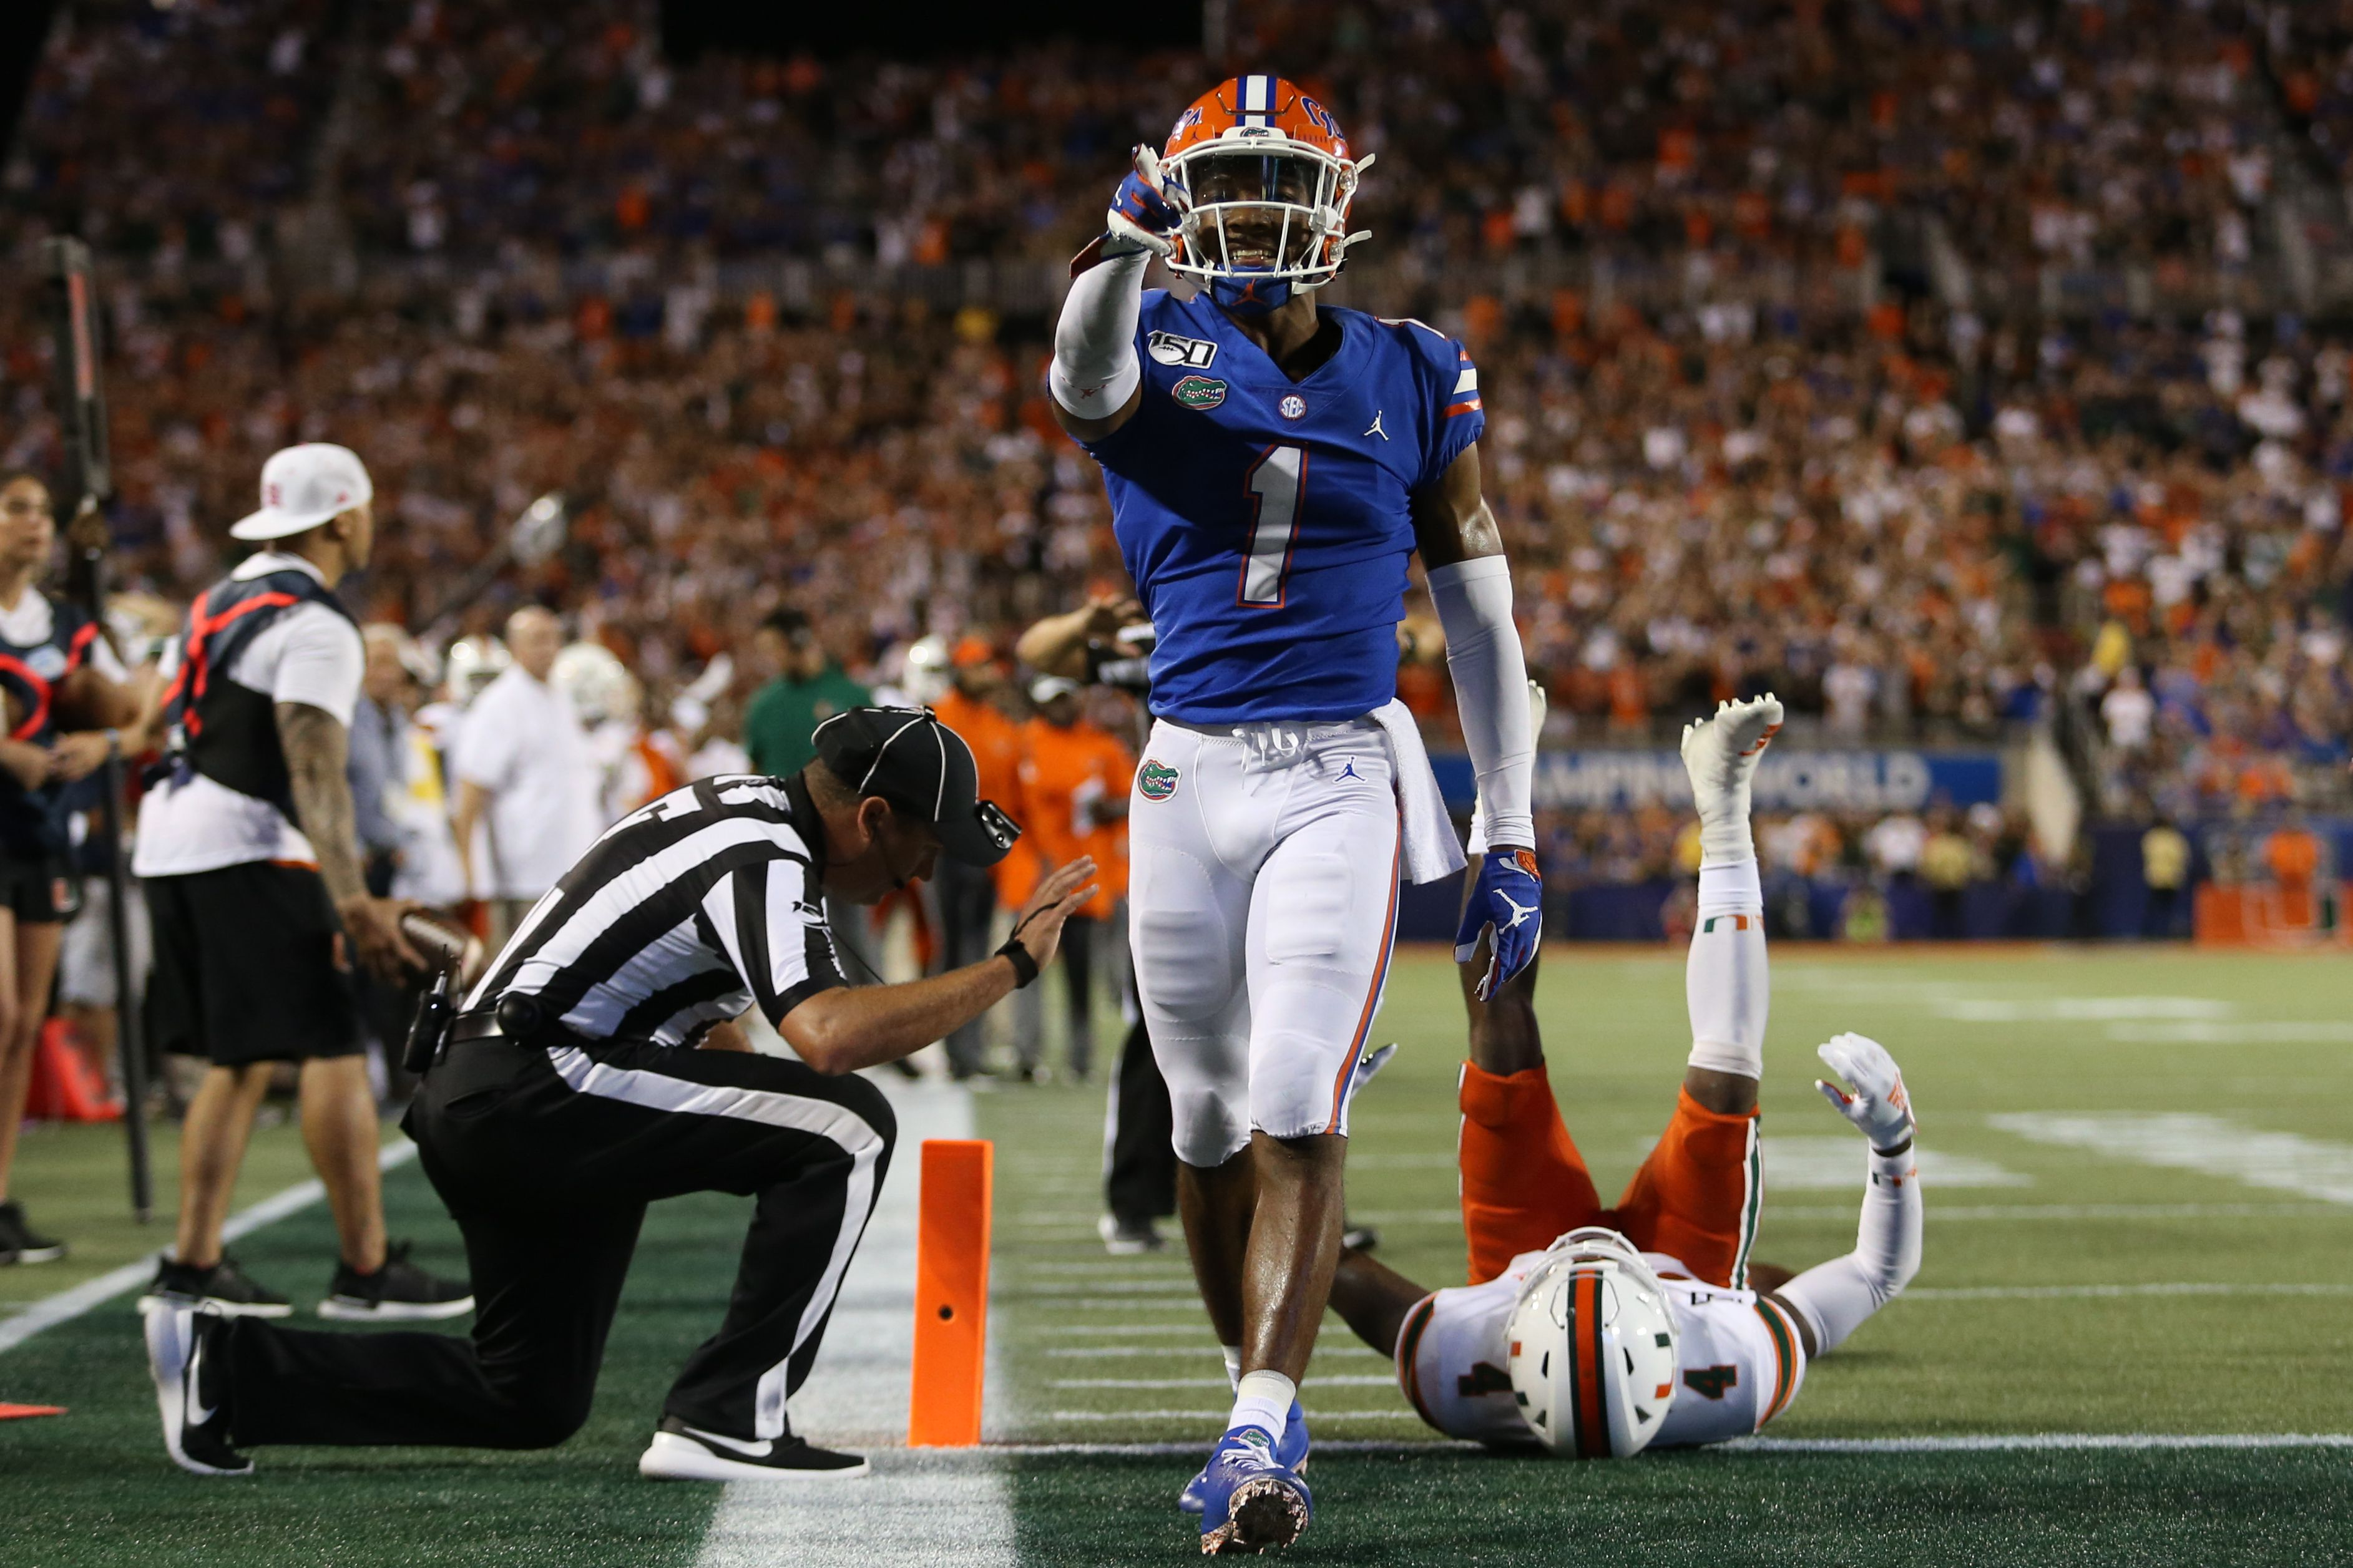 Florida player points at camera